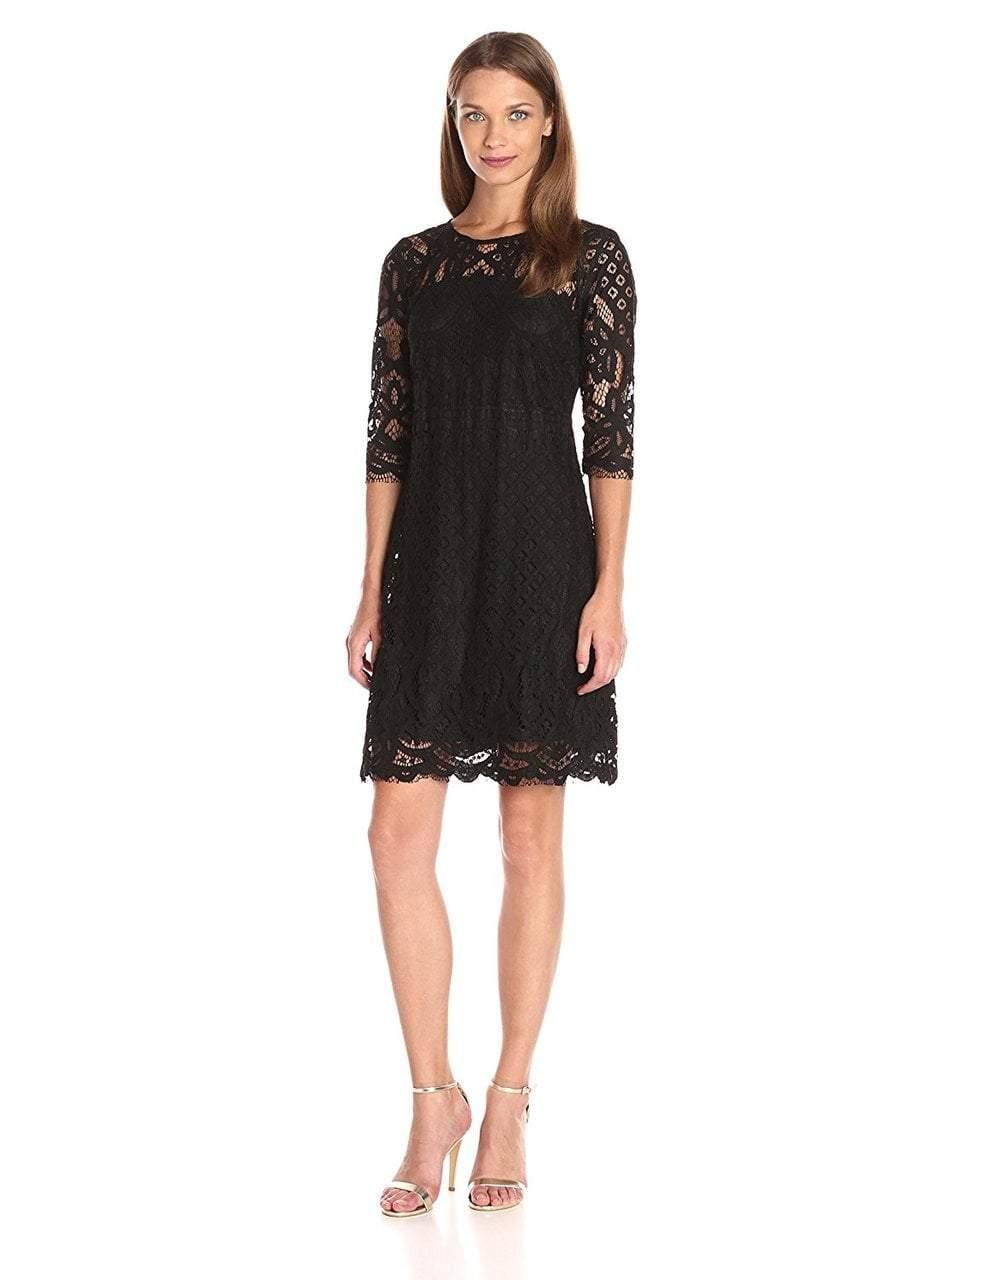 Taylor - Quarter Length Sleeve Lace Dress 8568MJ